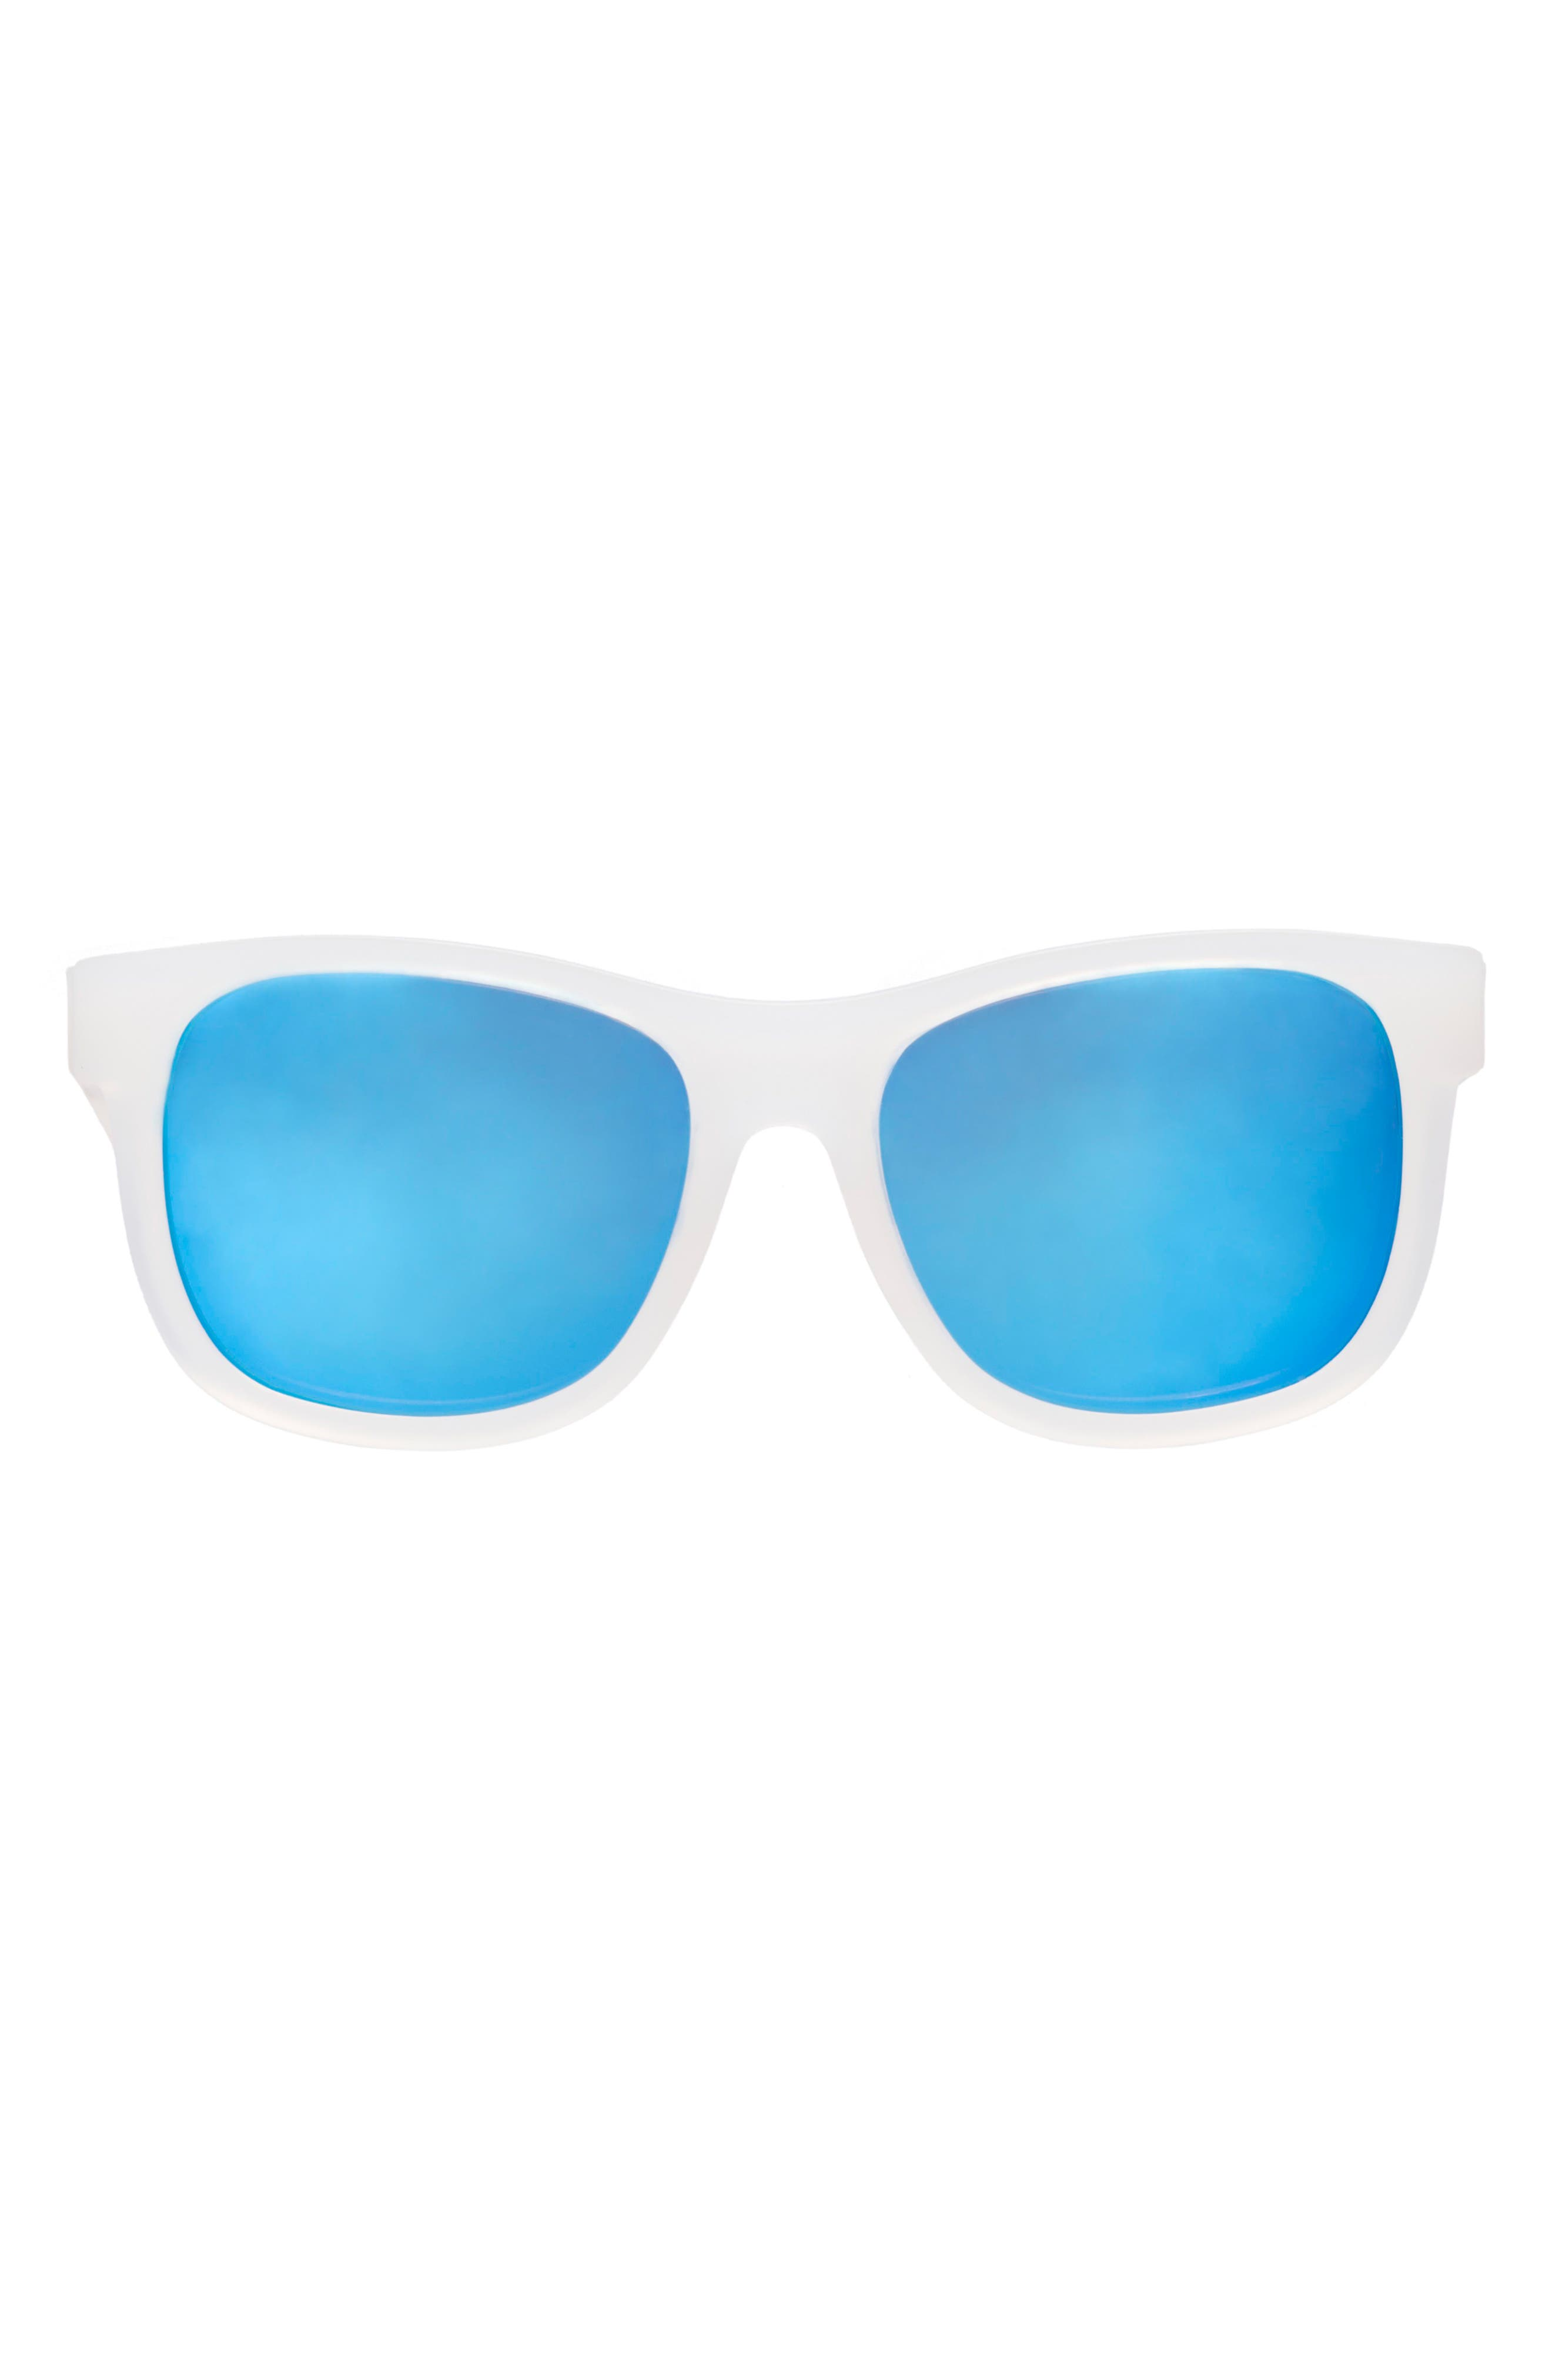 Original Navigator Sunglasses,                             Alternate thumbnail 2, color,                             BLUE ICE